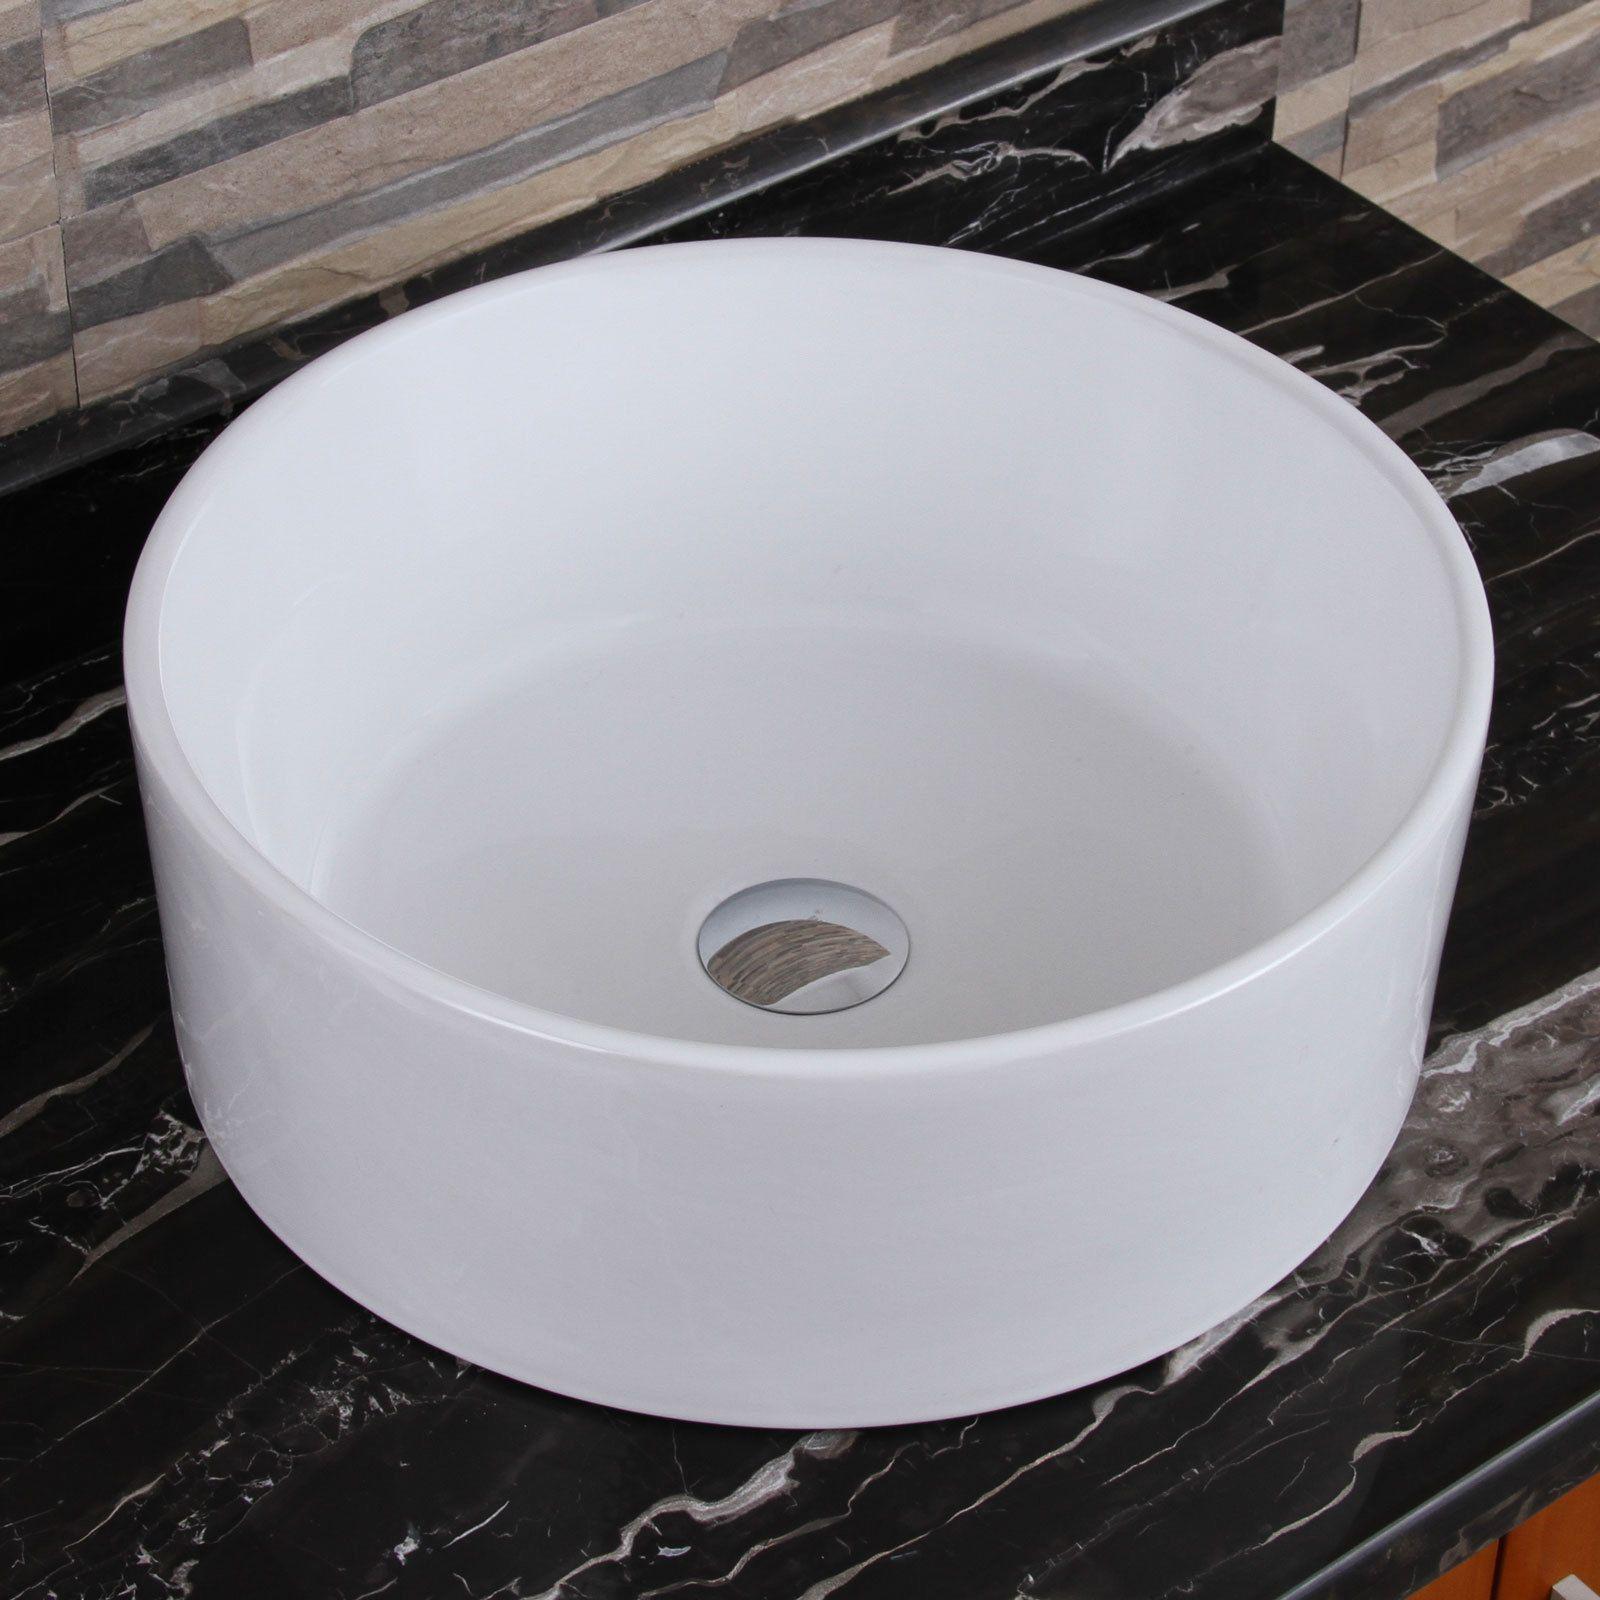 Elite Elimax 04 Round Shape White Porcelain Ceramic Bathroom